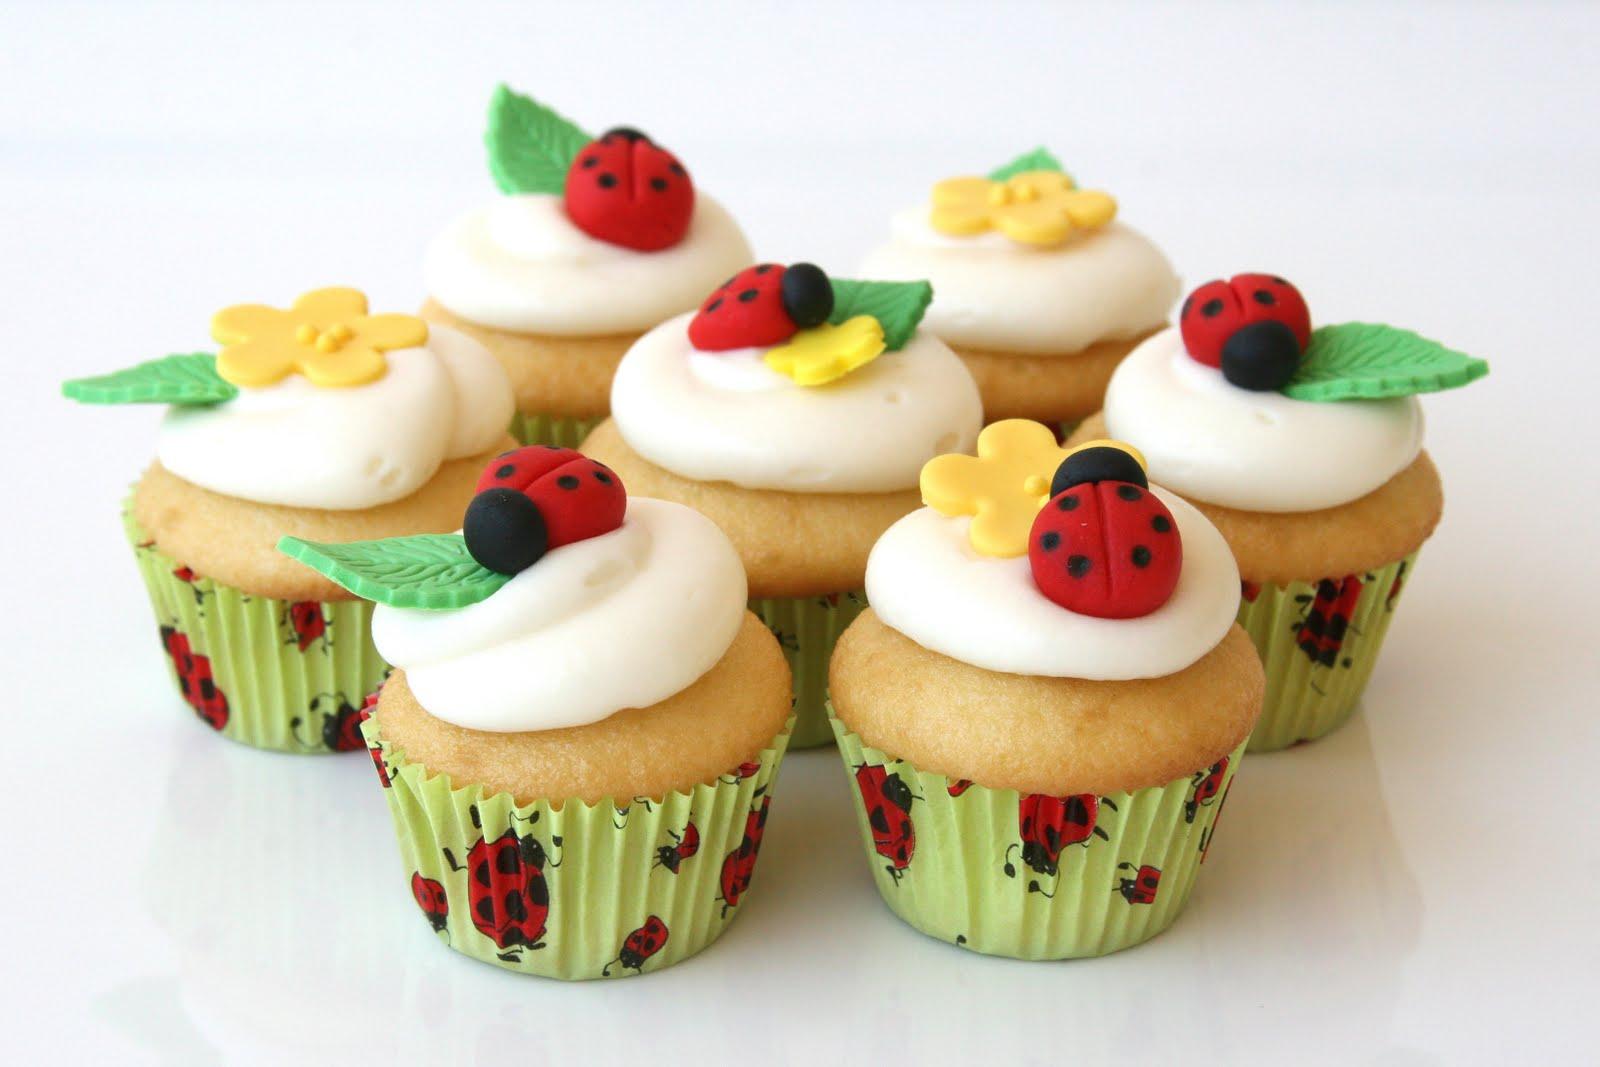 How To Make Fondant Ladybugs Glorious Treats - Bug cupcake decorating ideas